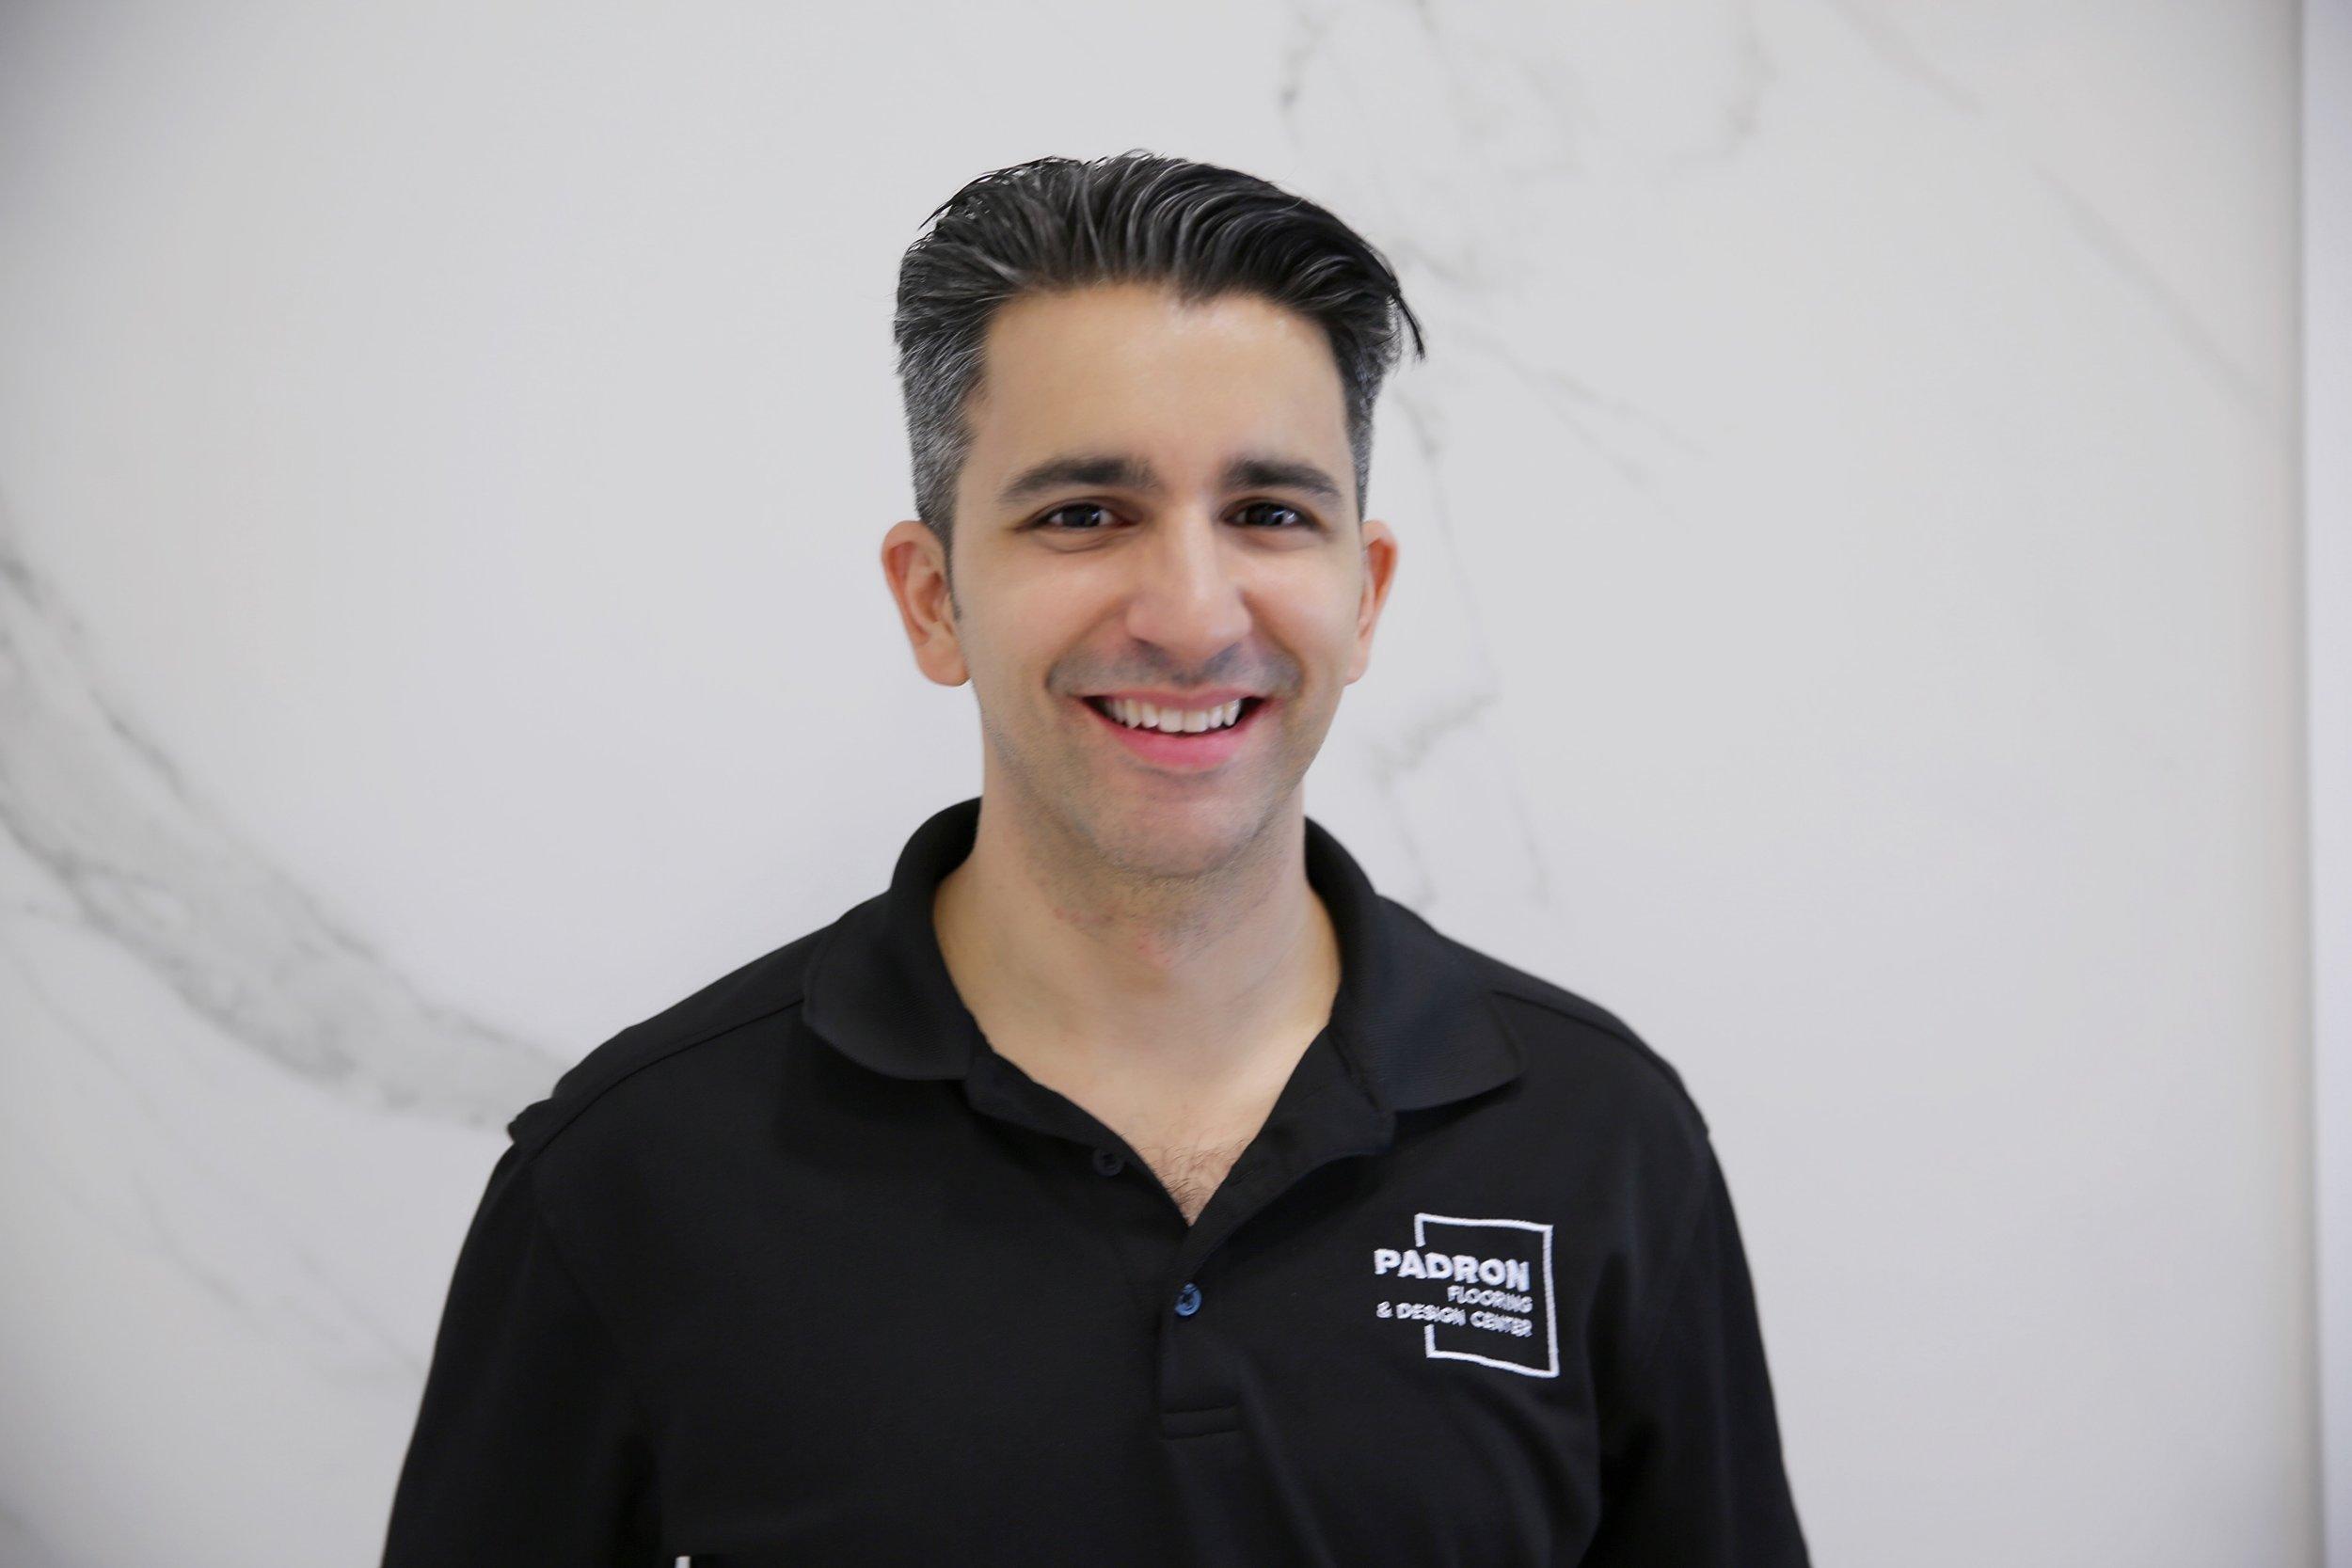 Daniel Padron